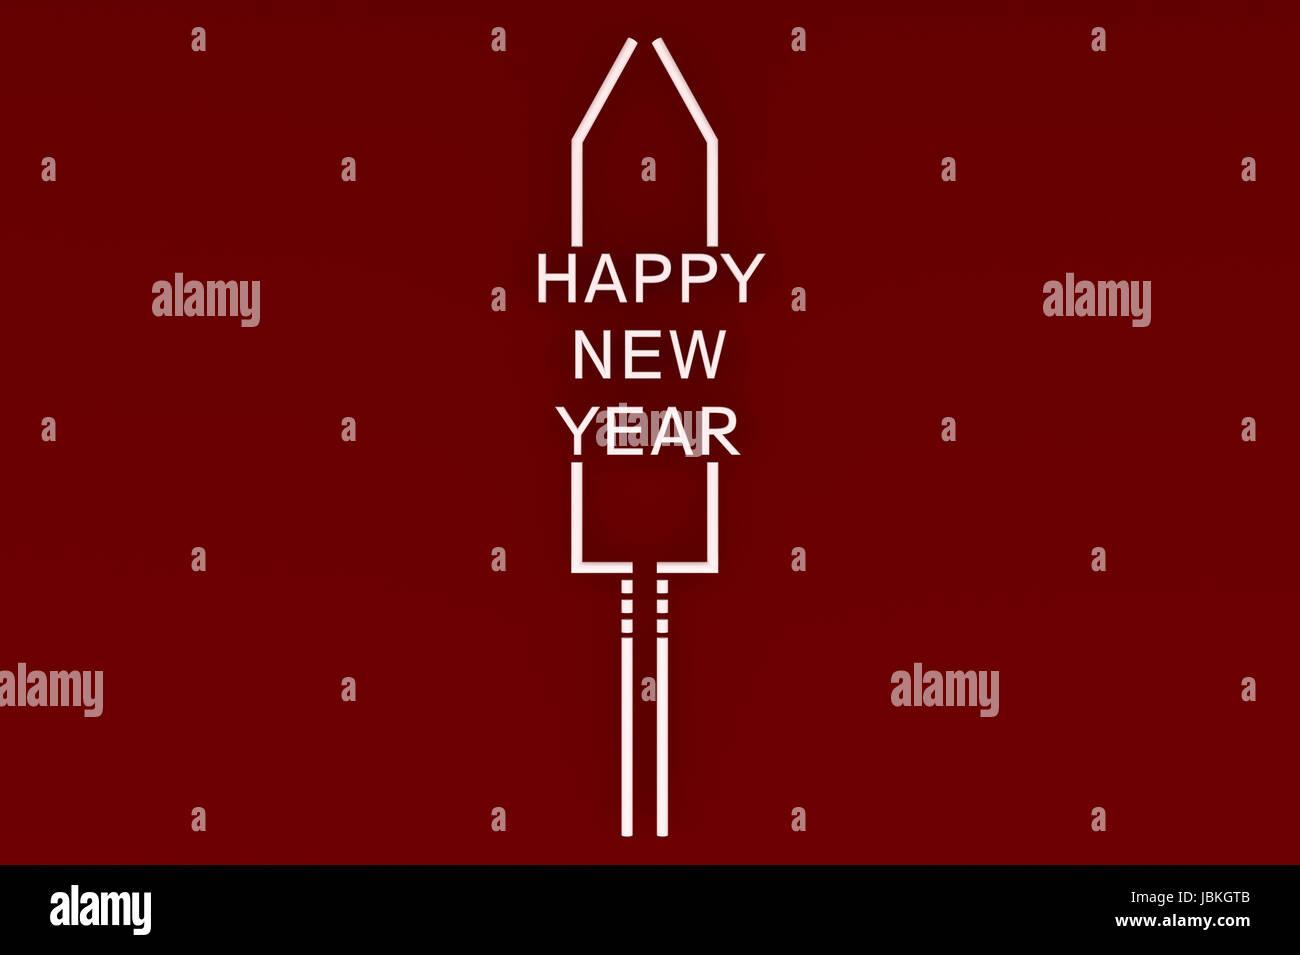 3d illustration Stylized New Year's Eve rocket on colored background - Stock Image